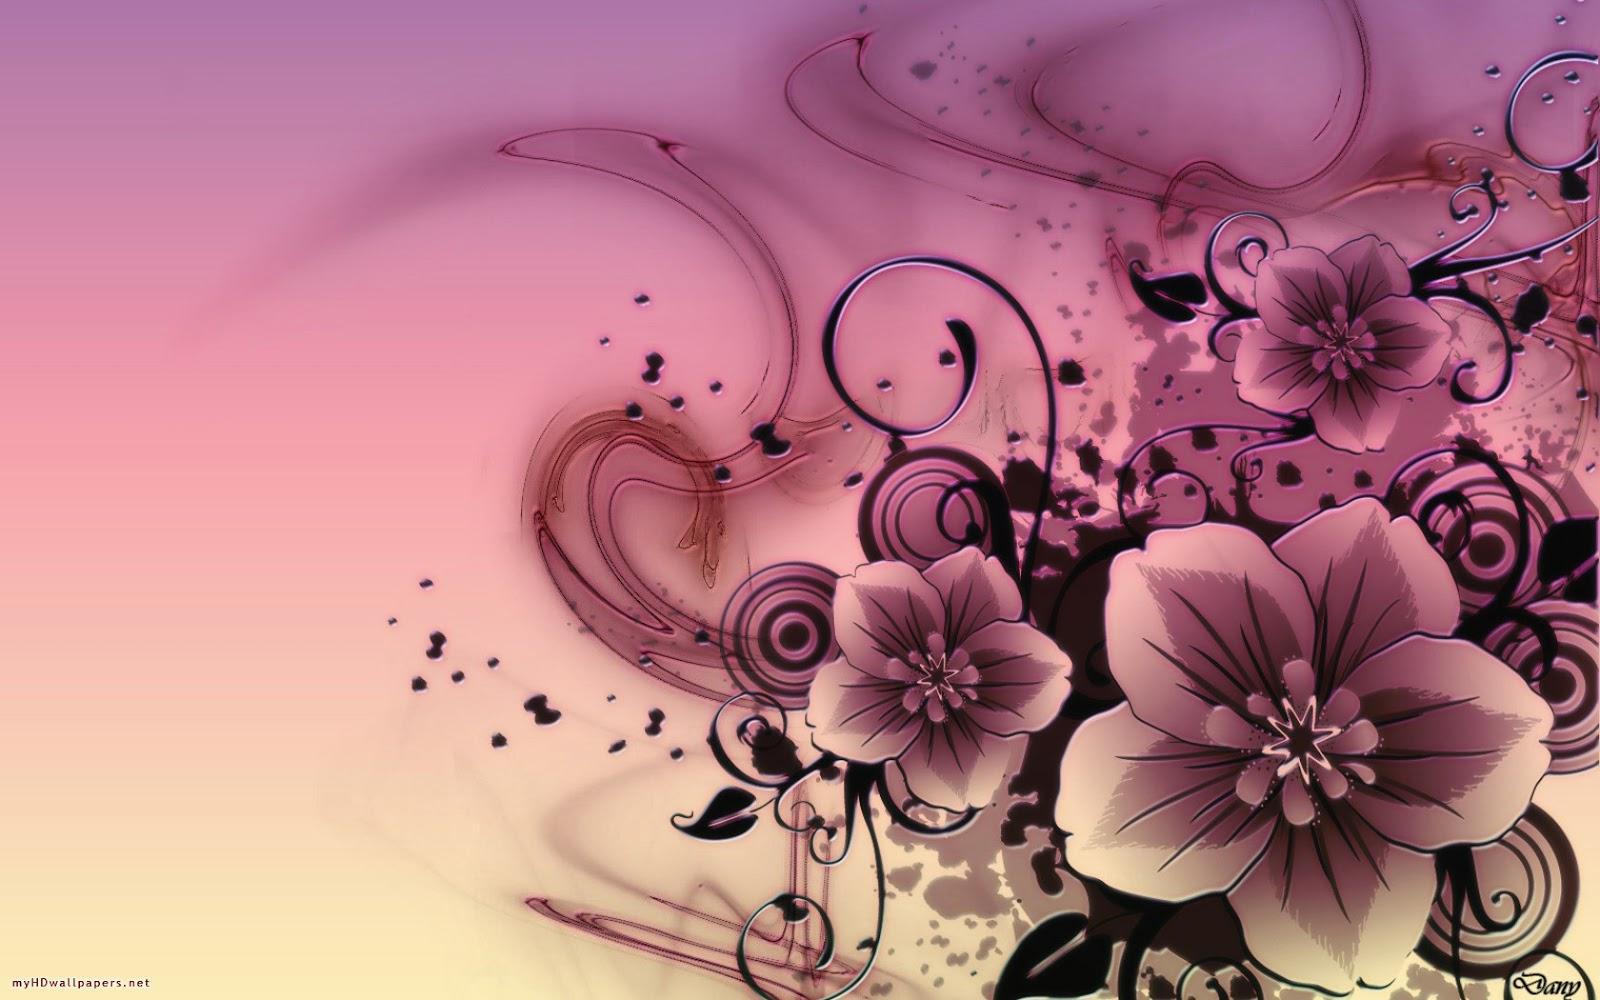 Abstract Design Flower Wallpaper: Wallpapers Dekstop 4 U: Abstract Flower Wallpaper